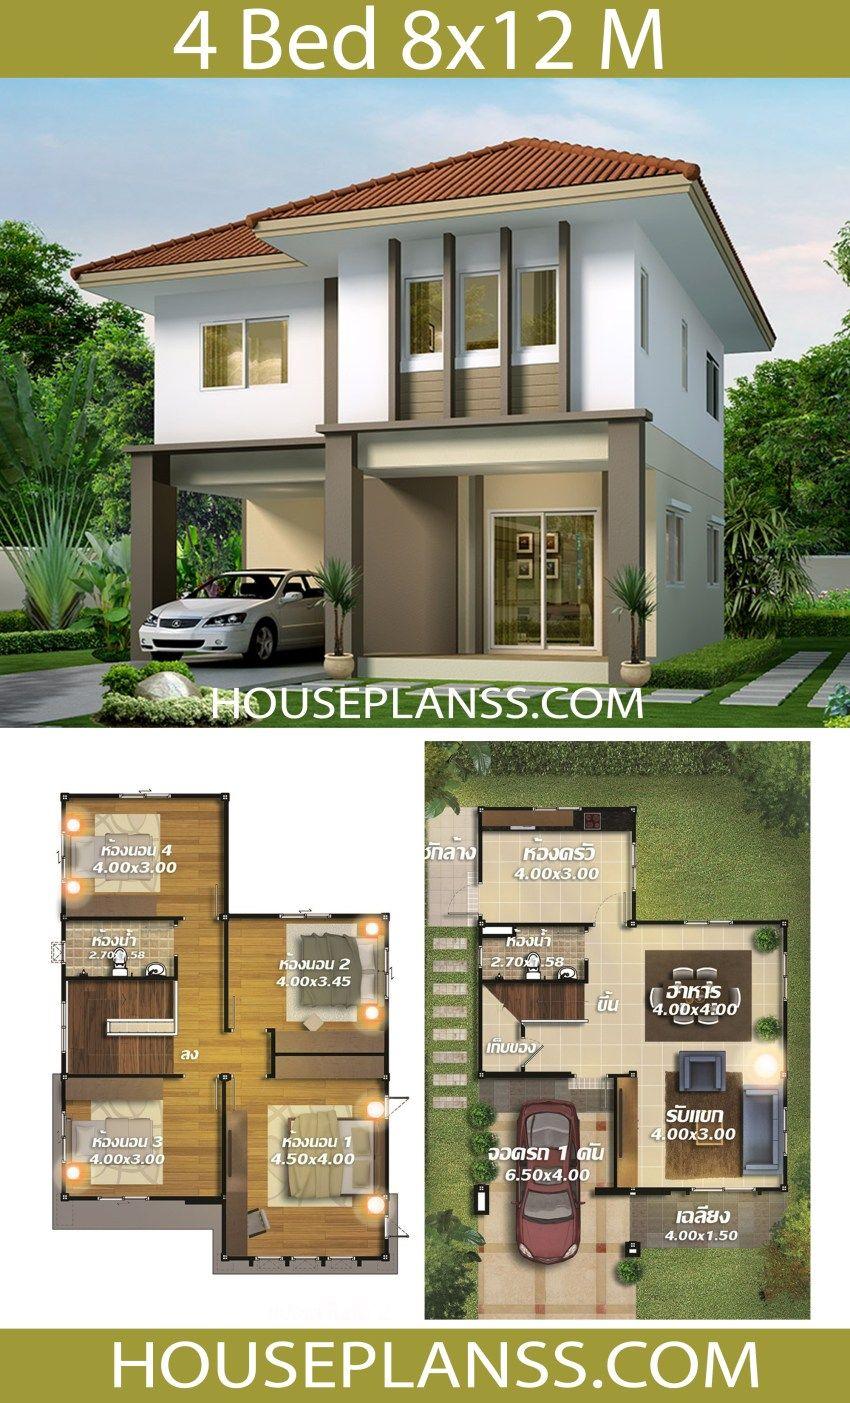 House Plans Design 8x12 With 4 Bedrooms House Plans Sam Arsitektur Rumah Desain Rumah Denah Rumah